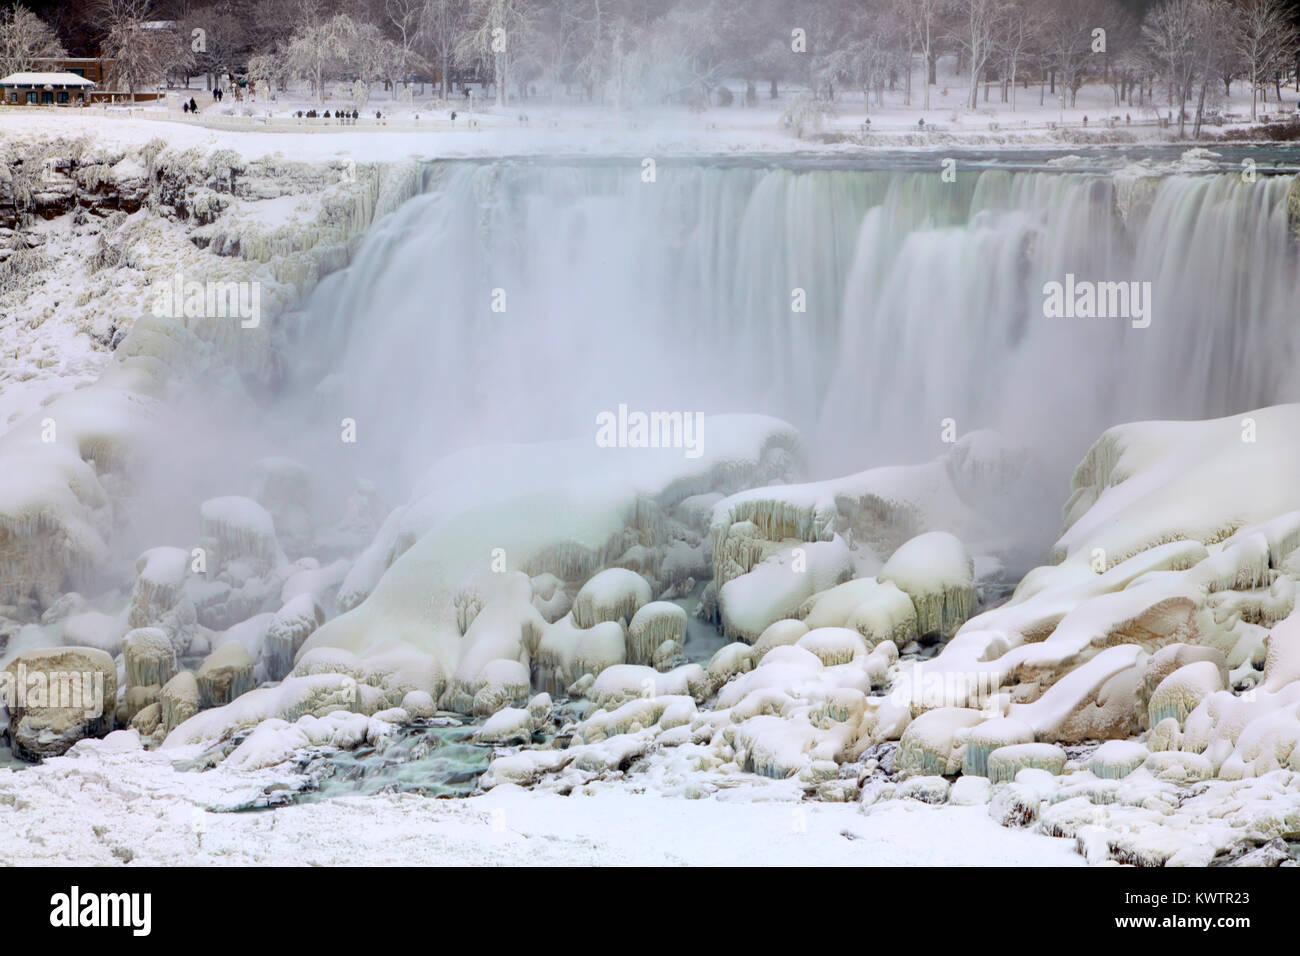 Niagara Falls Ice Studies Jan 2018 Stock Photo 170804651